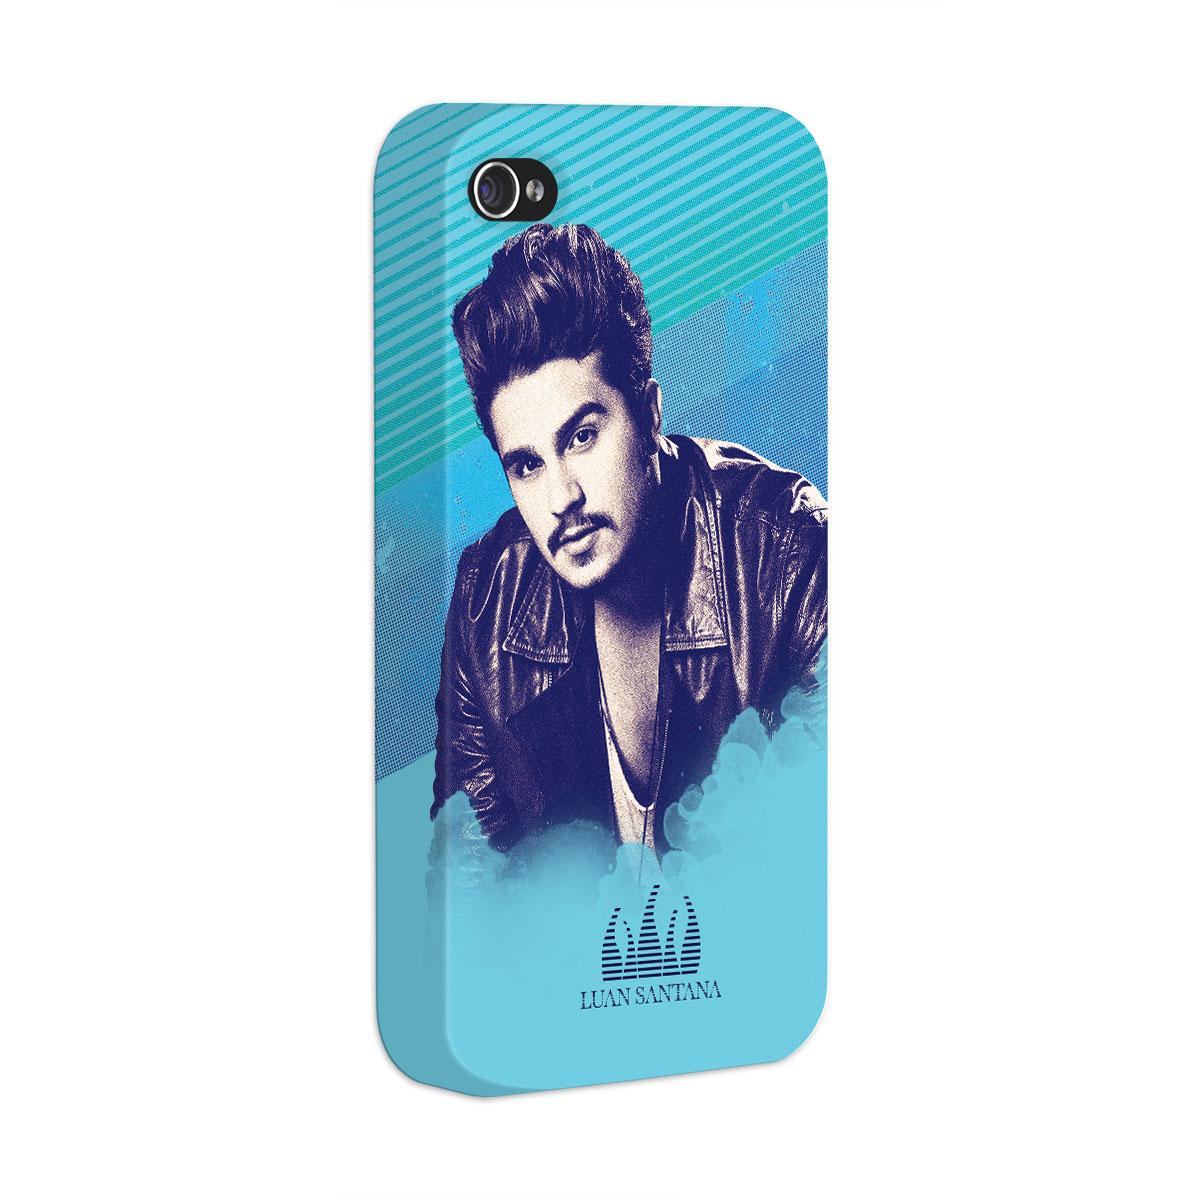 Capa iPhone 4/4S Luan Santana Sky